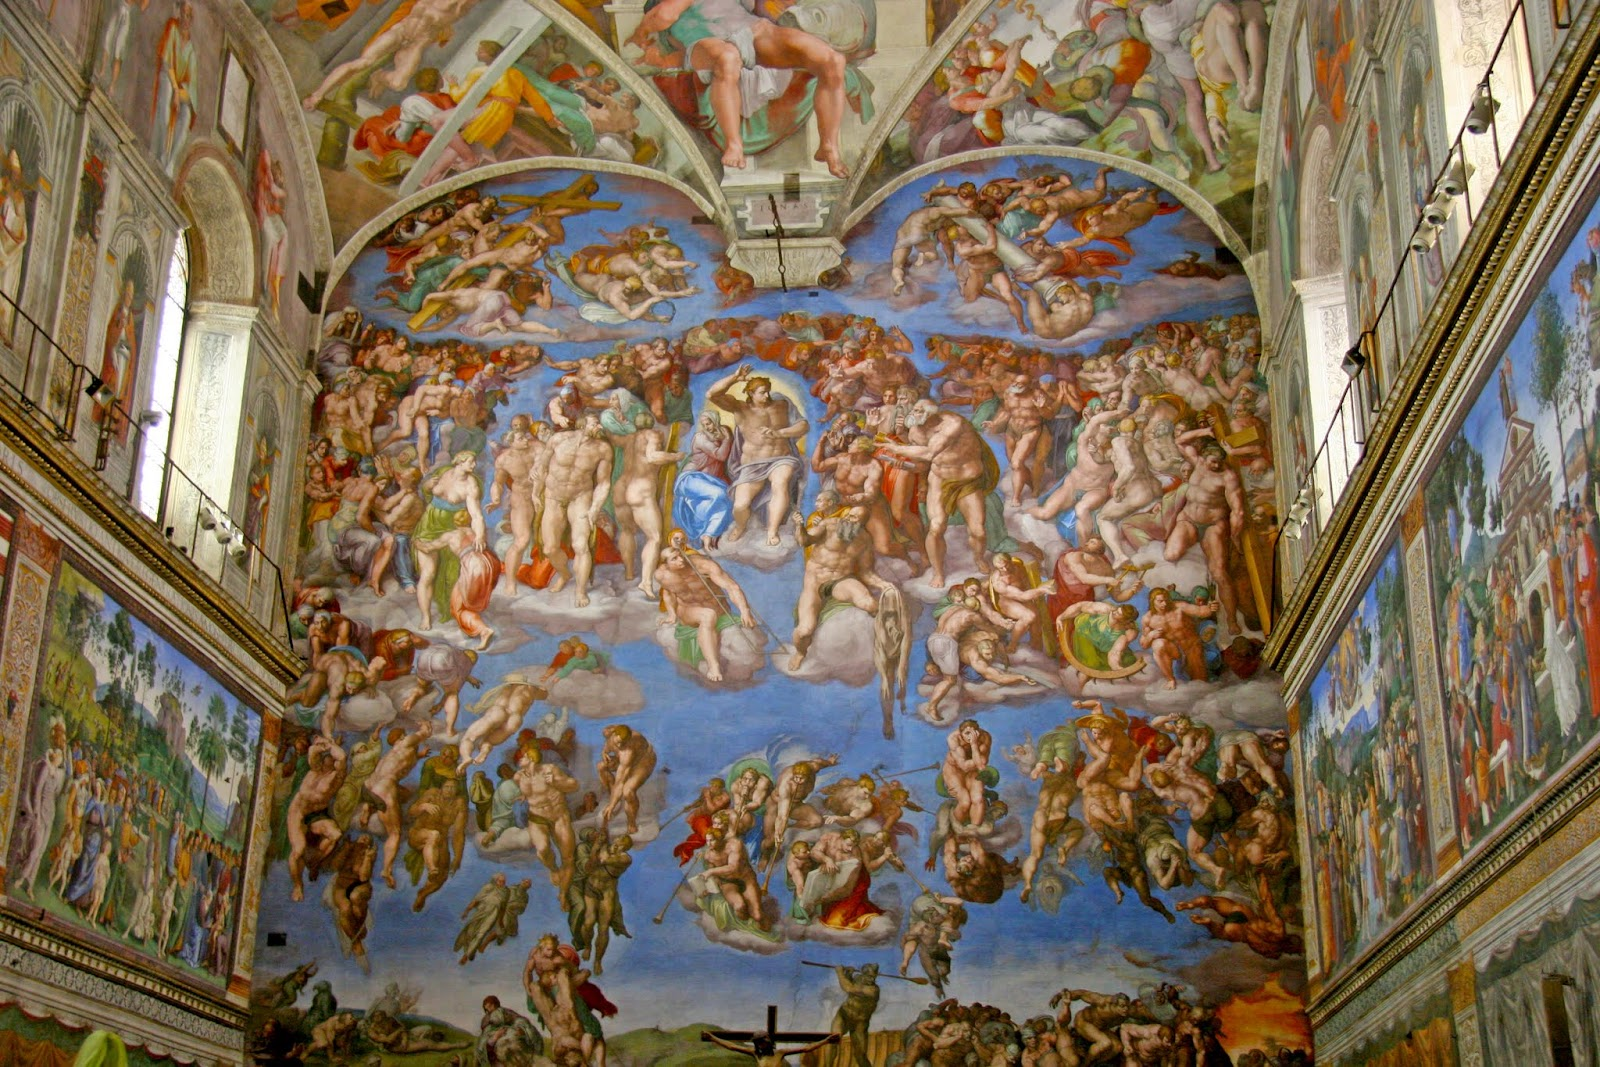 Vatikan %25E6%25A2%25B5%25E8%2592%2582%25E5%25B2%25A1%25E5%258D%259A%25E7%2589%25A9%25E9%25A4%25A8+_+Vatican+Museums200A